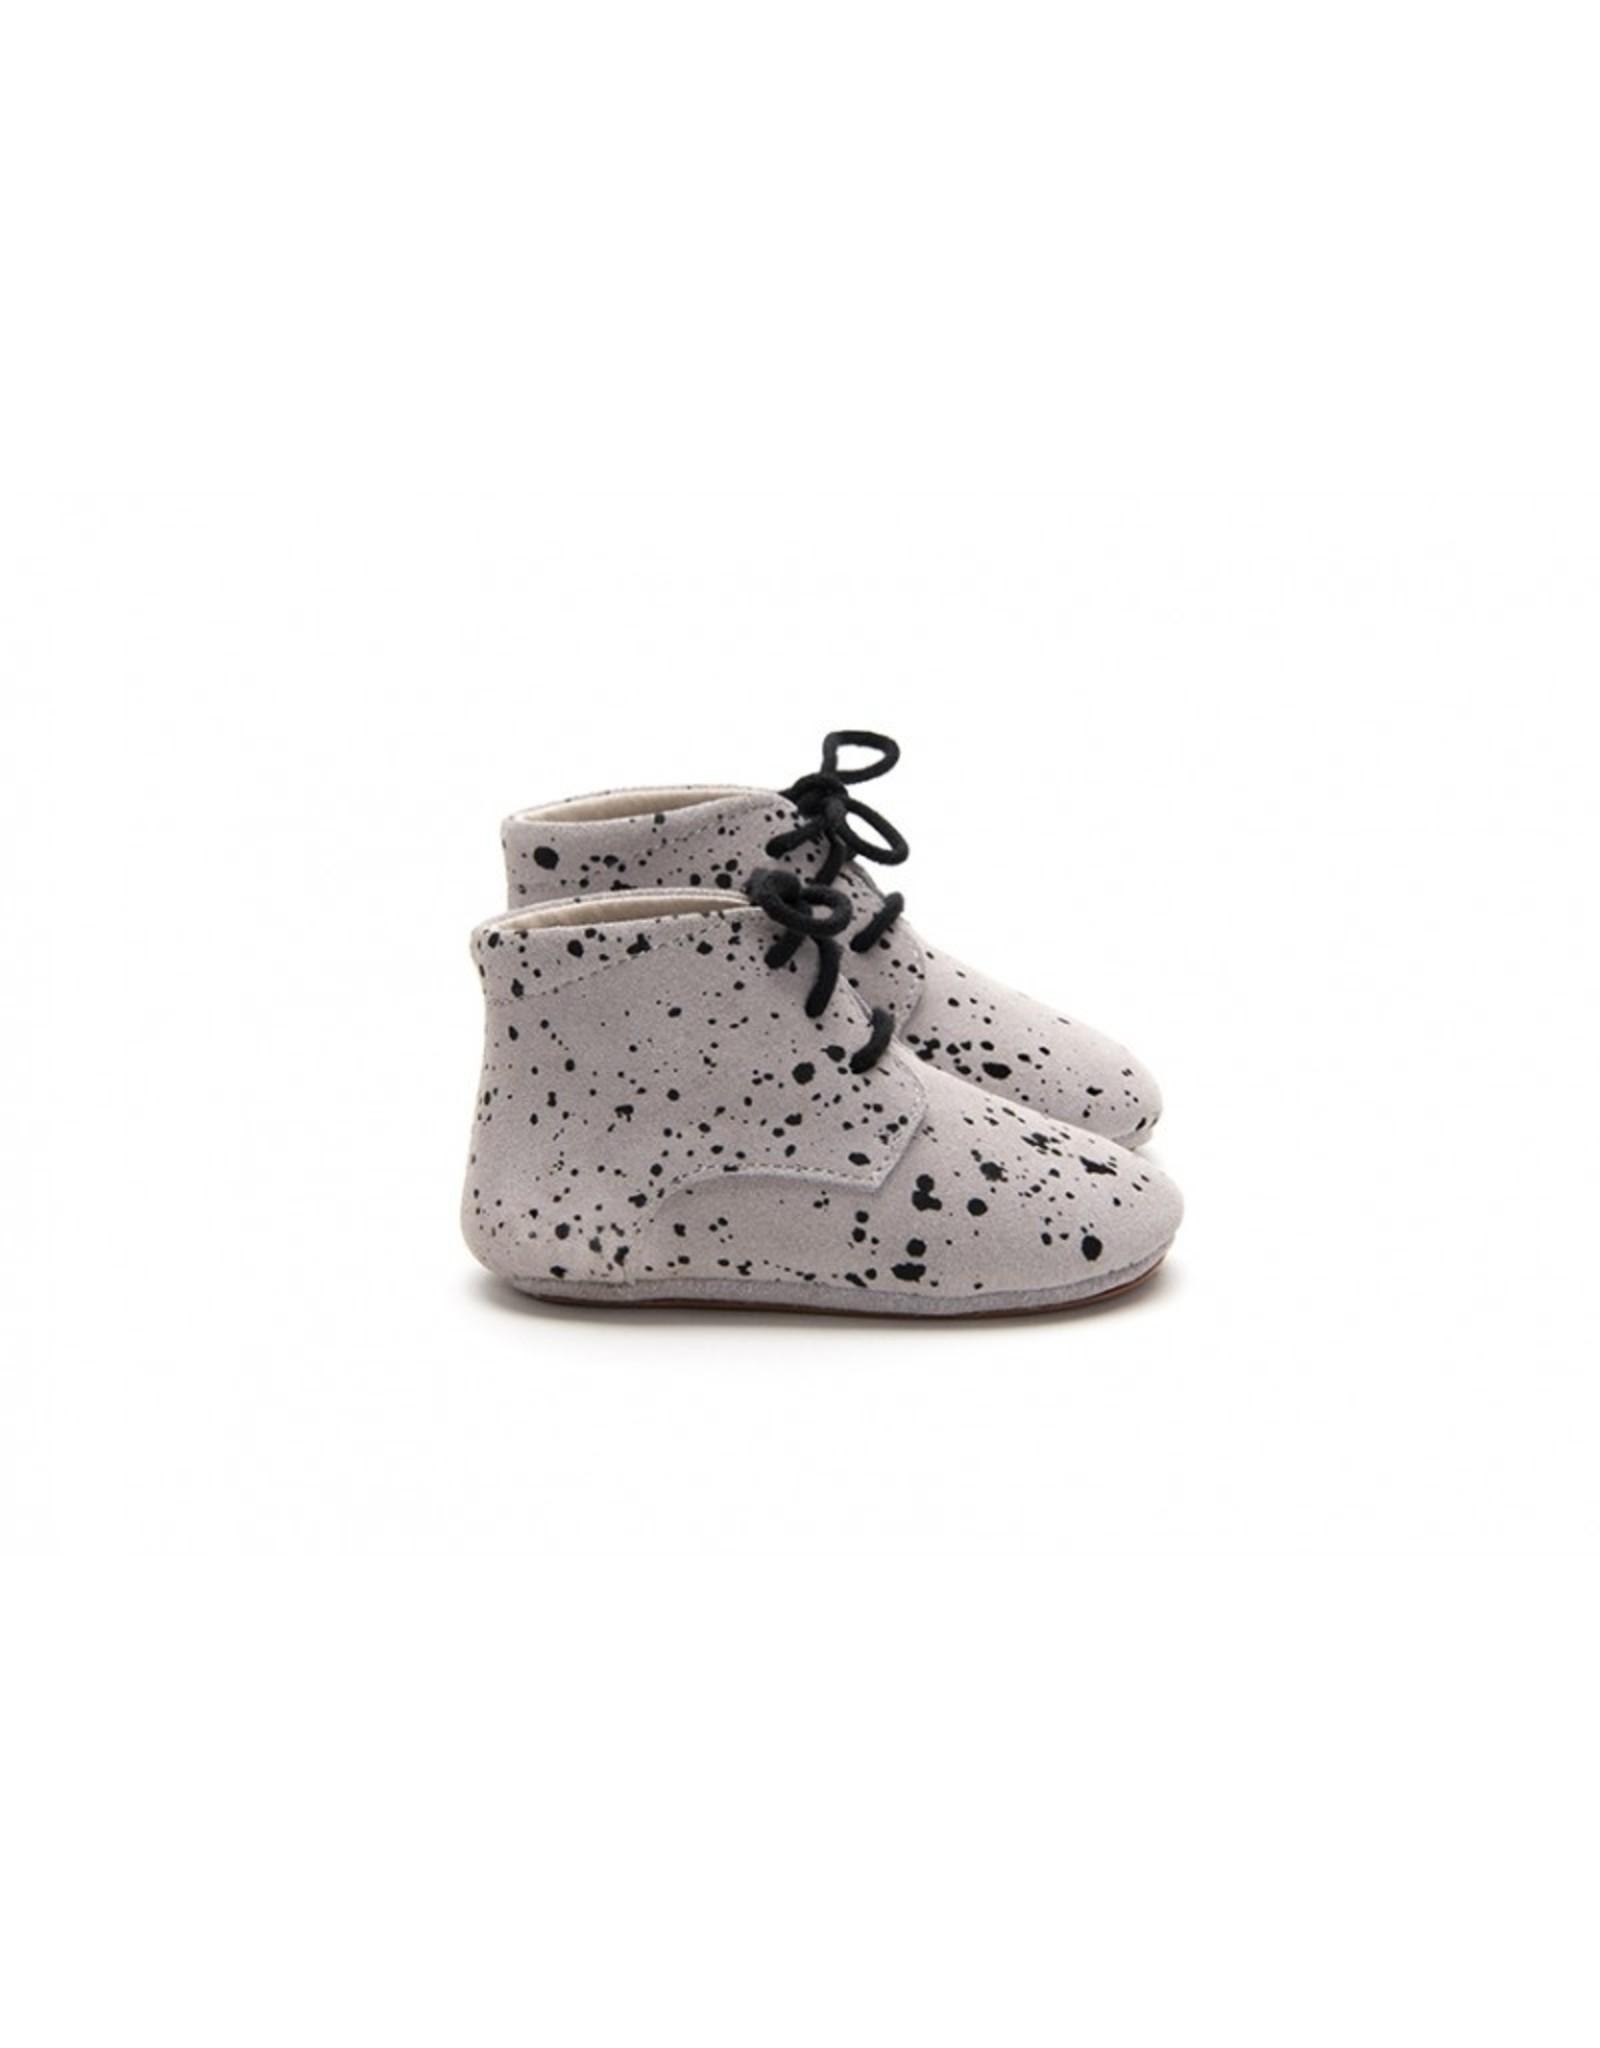 Mockies Mockies Classic Boots Taupe Paint